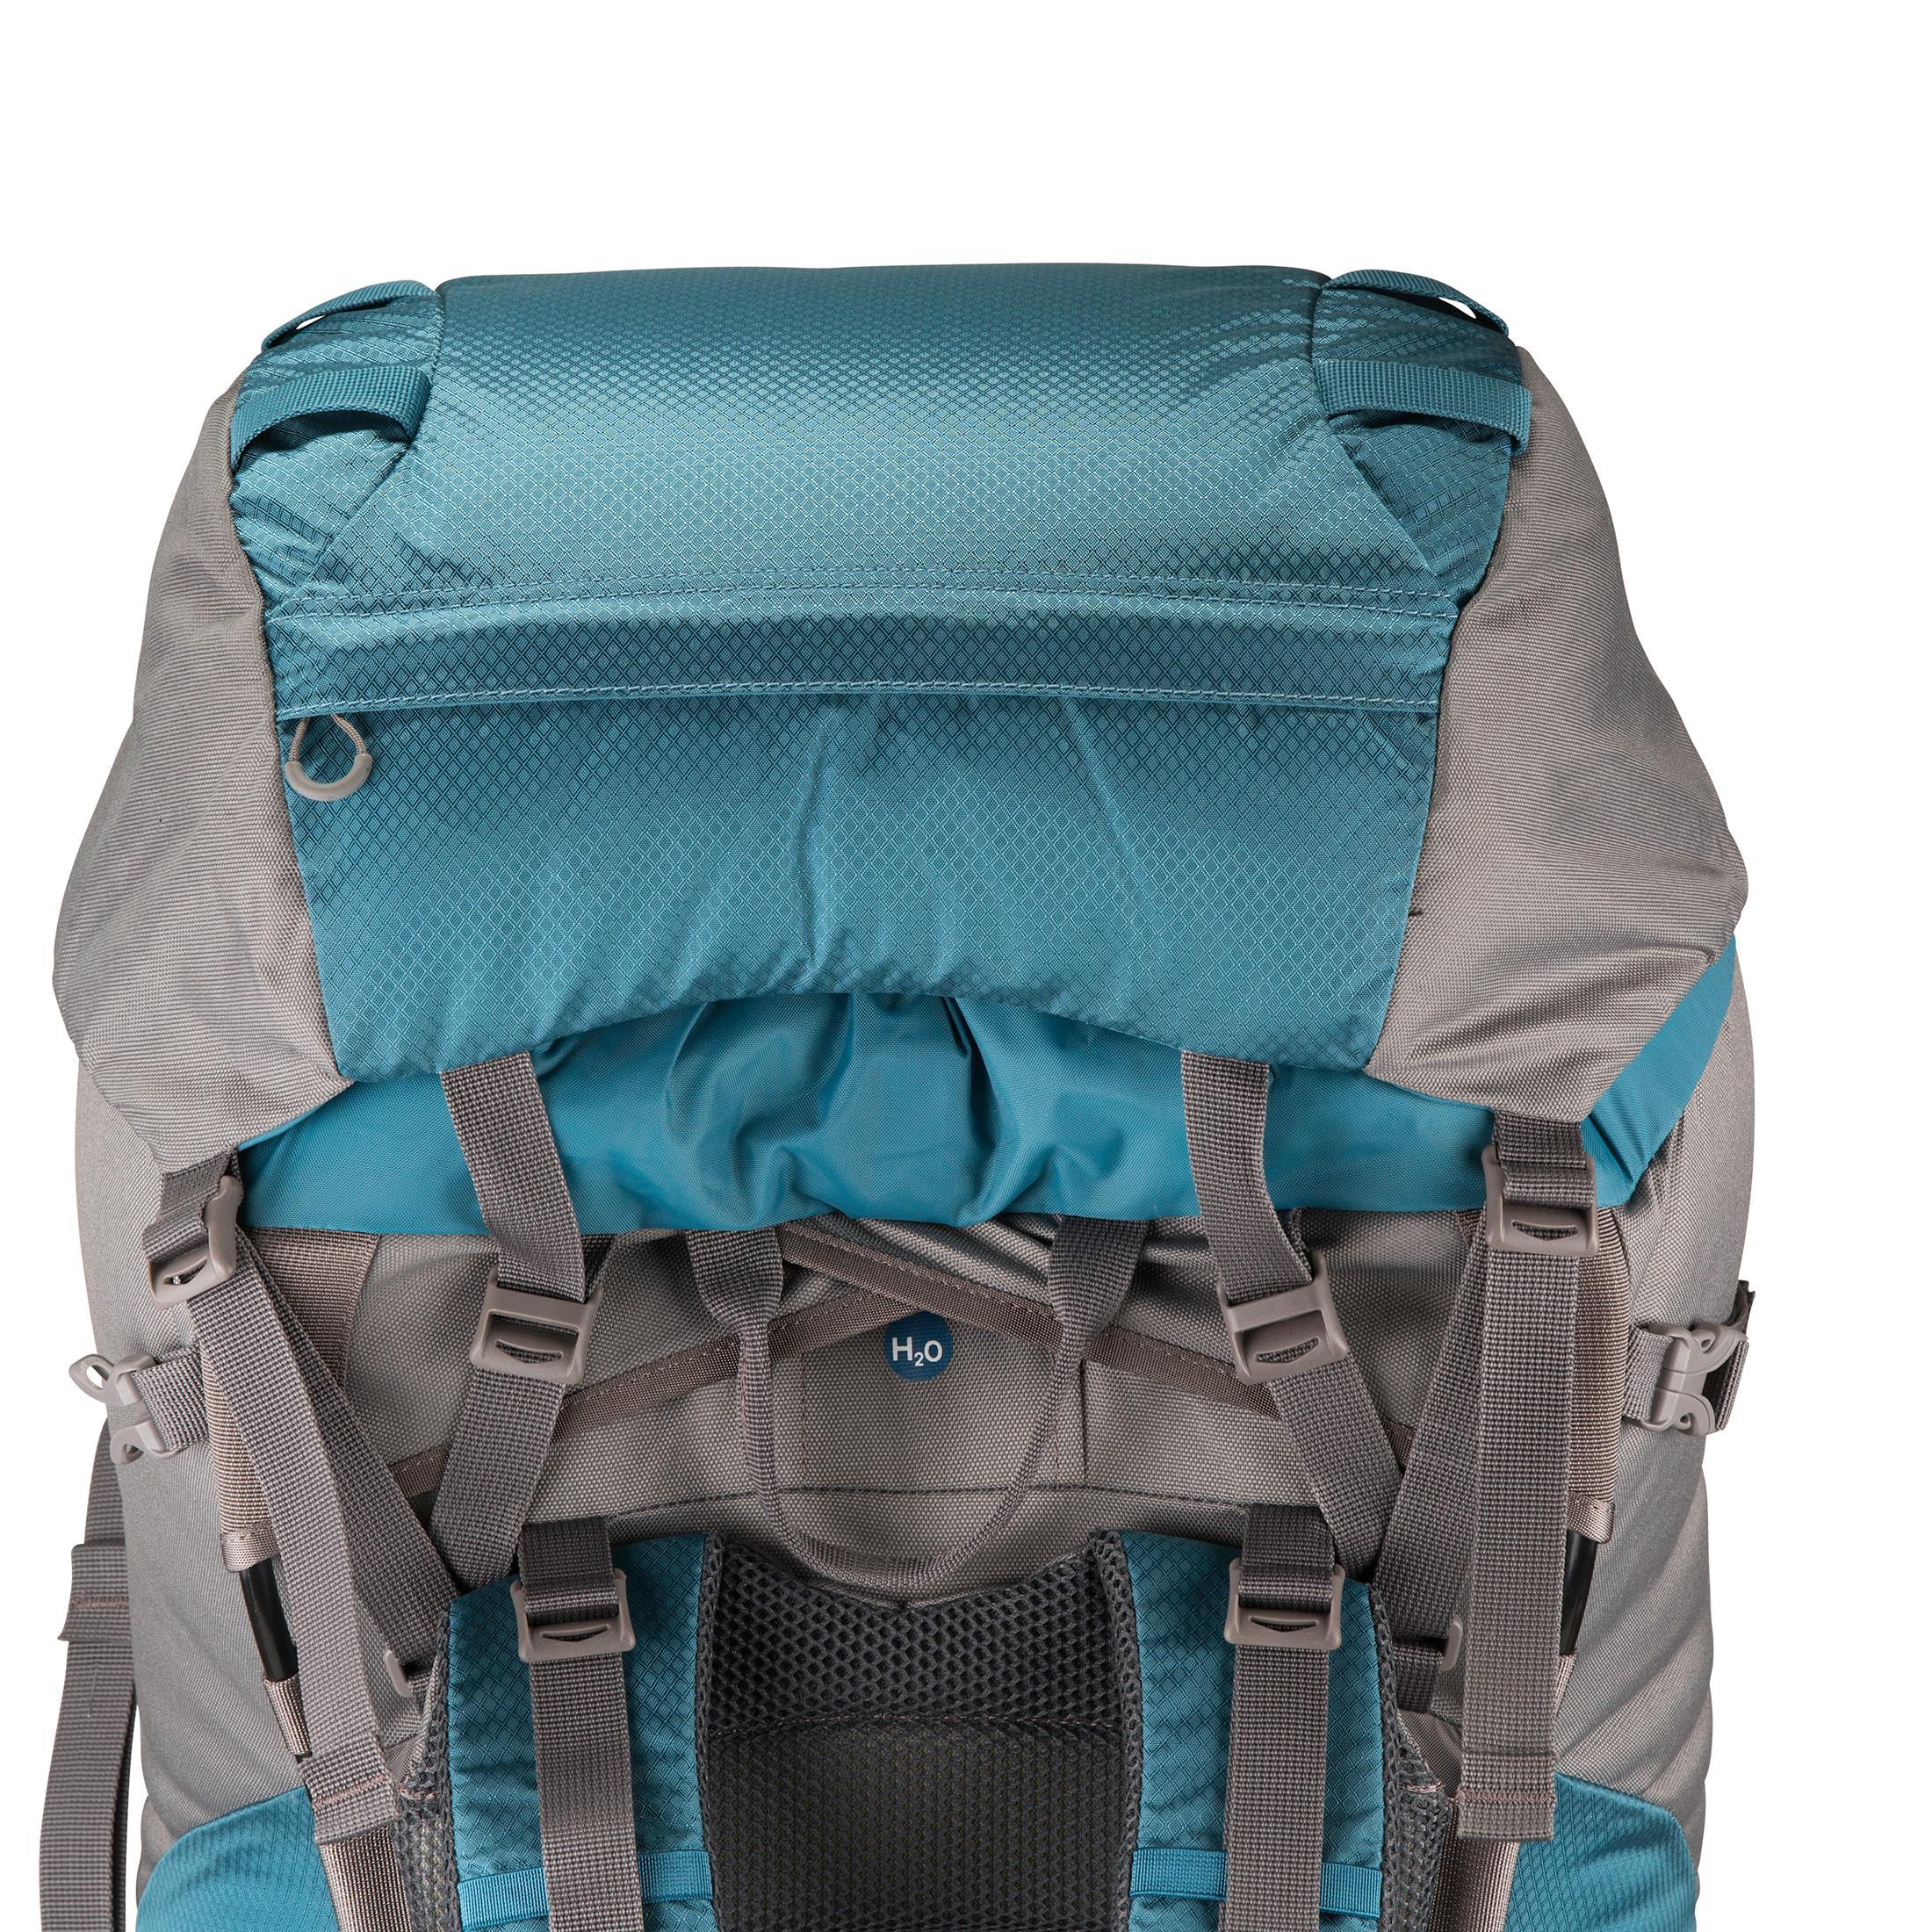 Amazon.com: Osprey Packs Volt 60 Backpack, Carmine Red ...